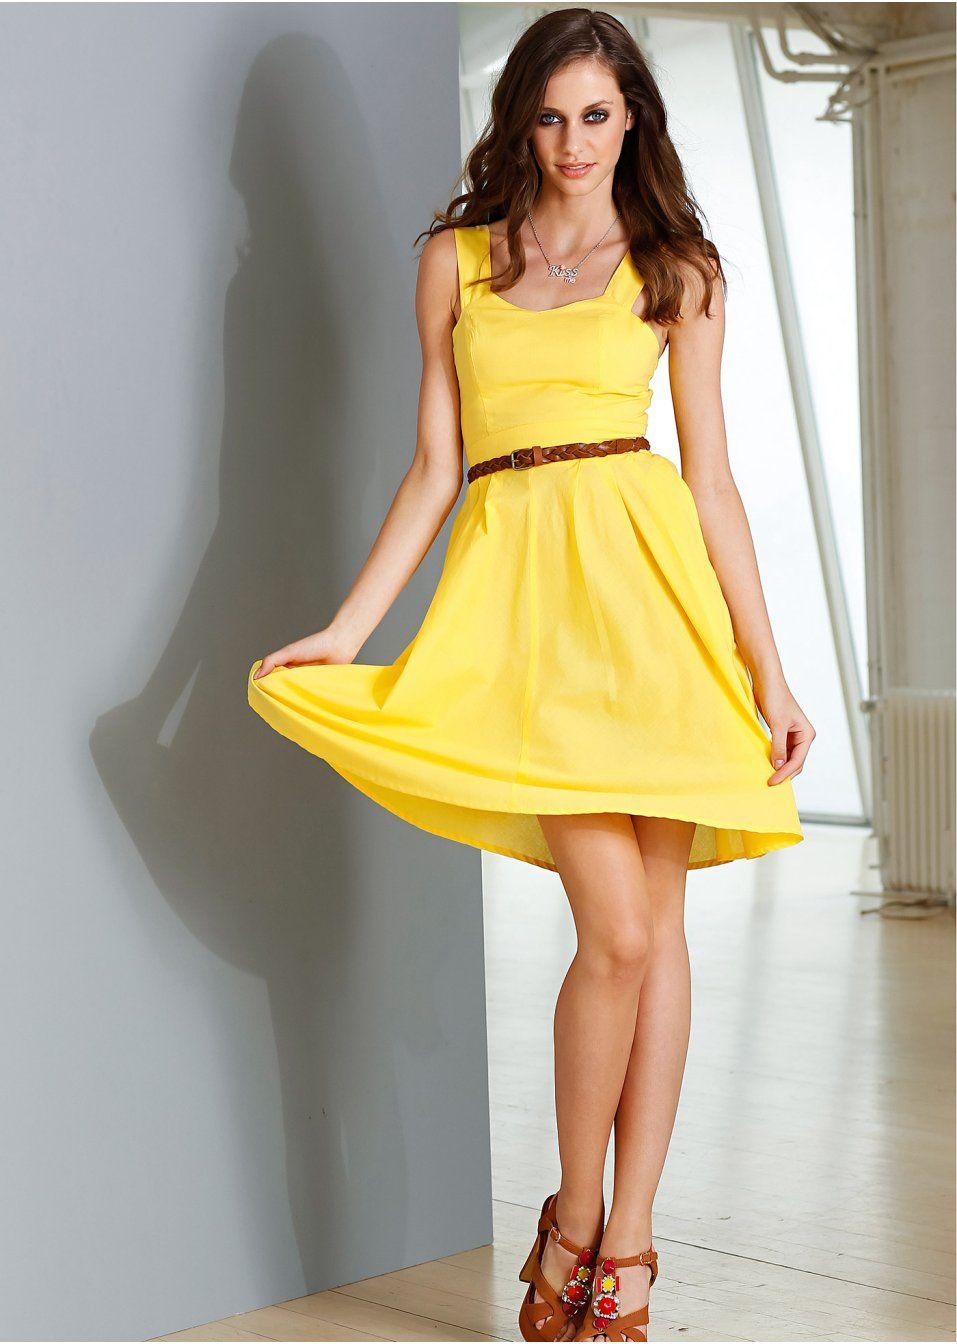 la robe jaune rainbow tenue jaune pinterest robe jaune la robe et jaune. Black Bedroom Furniture Sets. Home Design Ideas